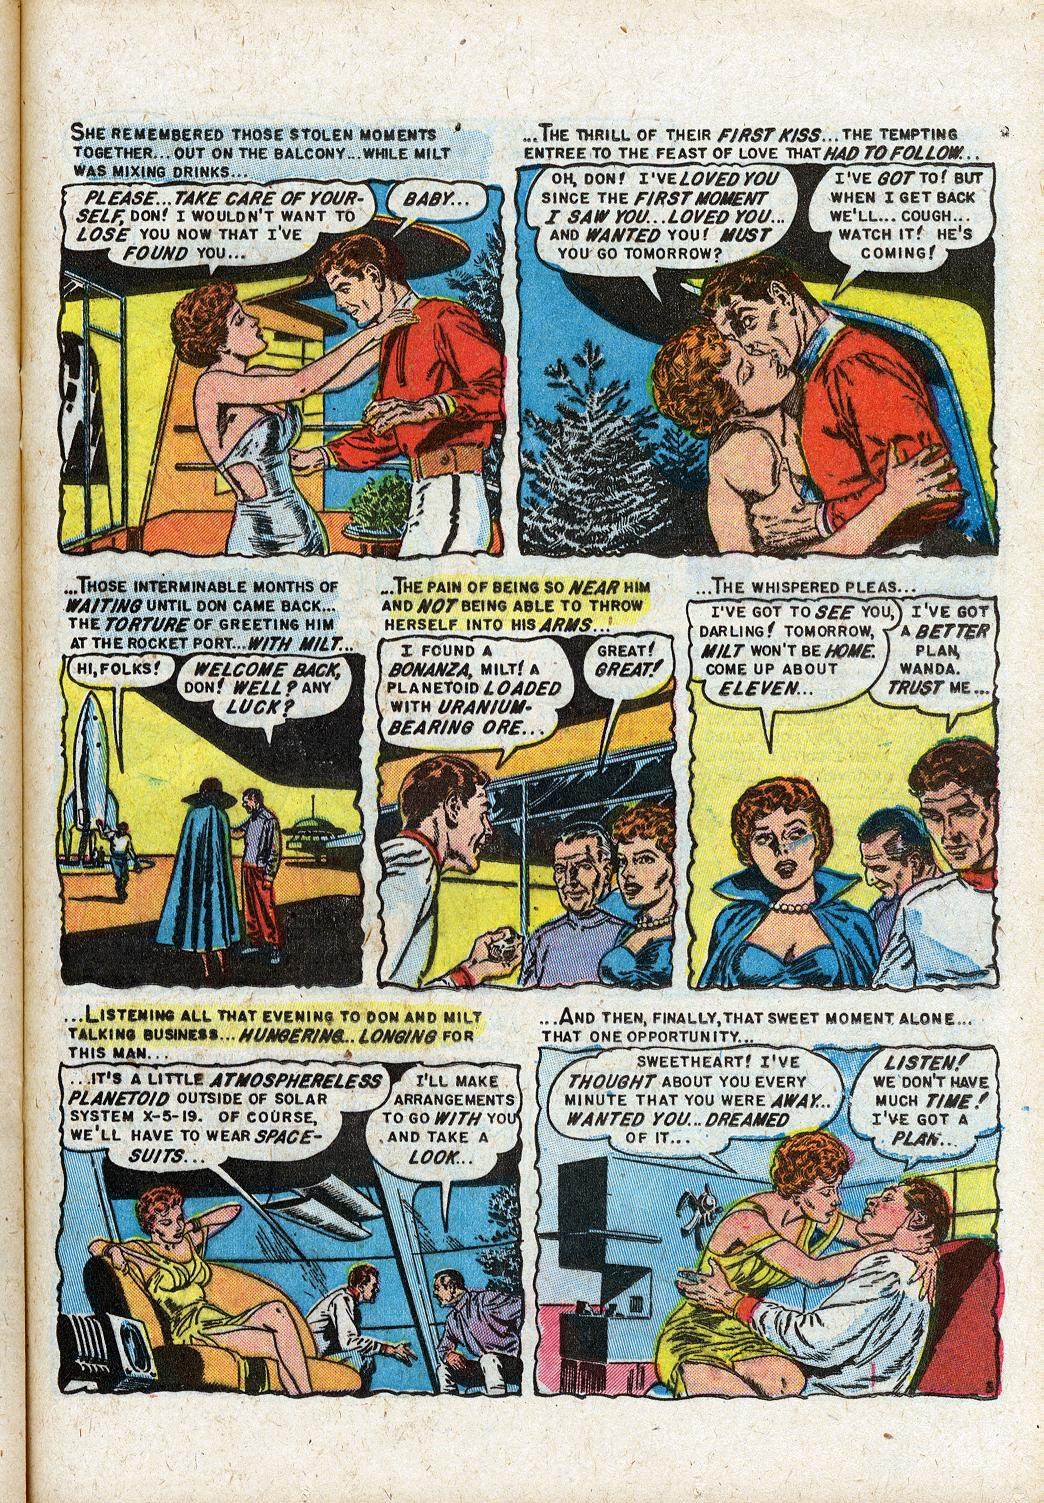 Read online Shock SuspenStories comic -  Issue #11 - 23